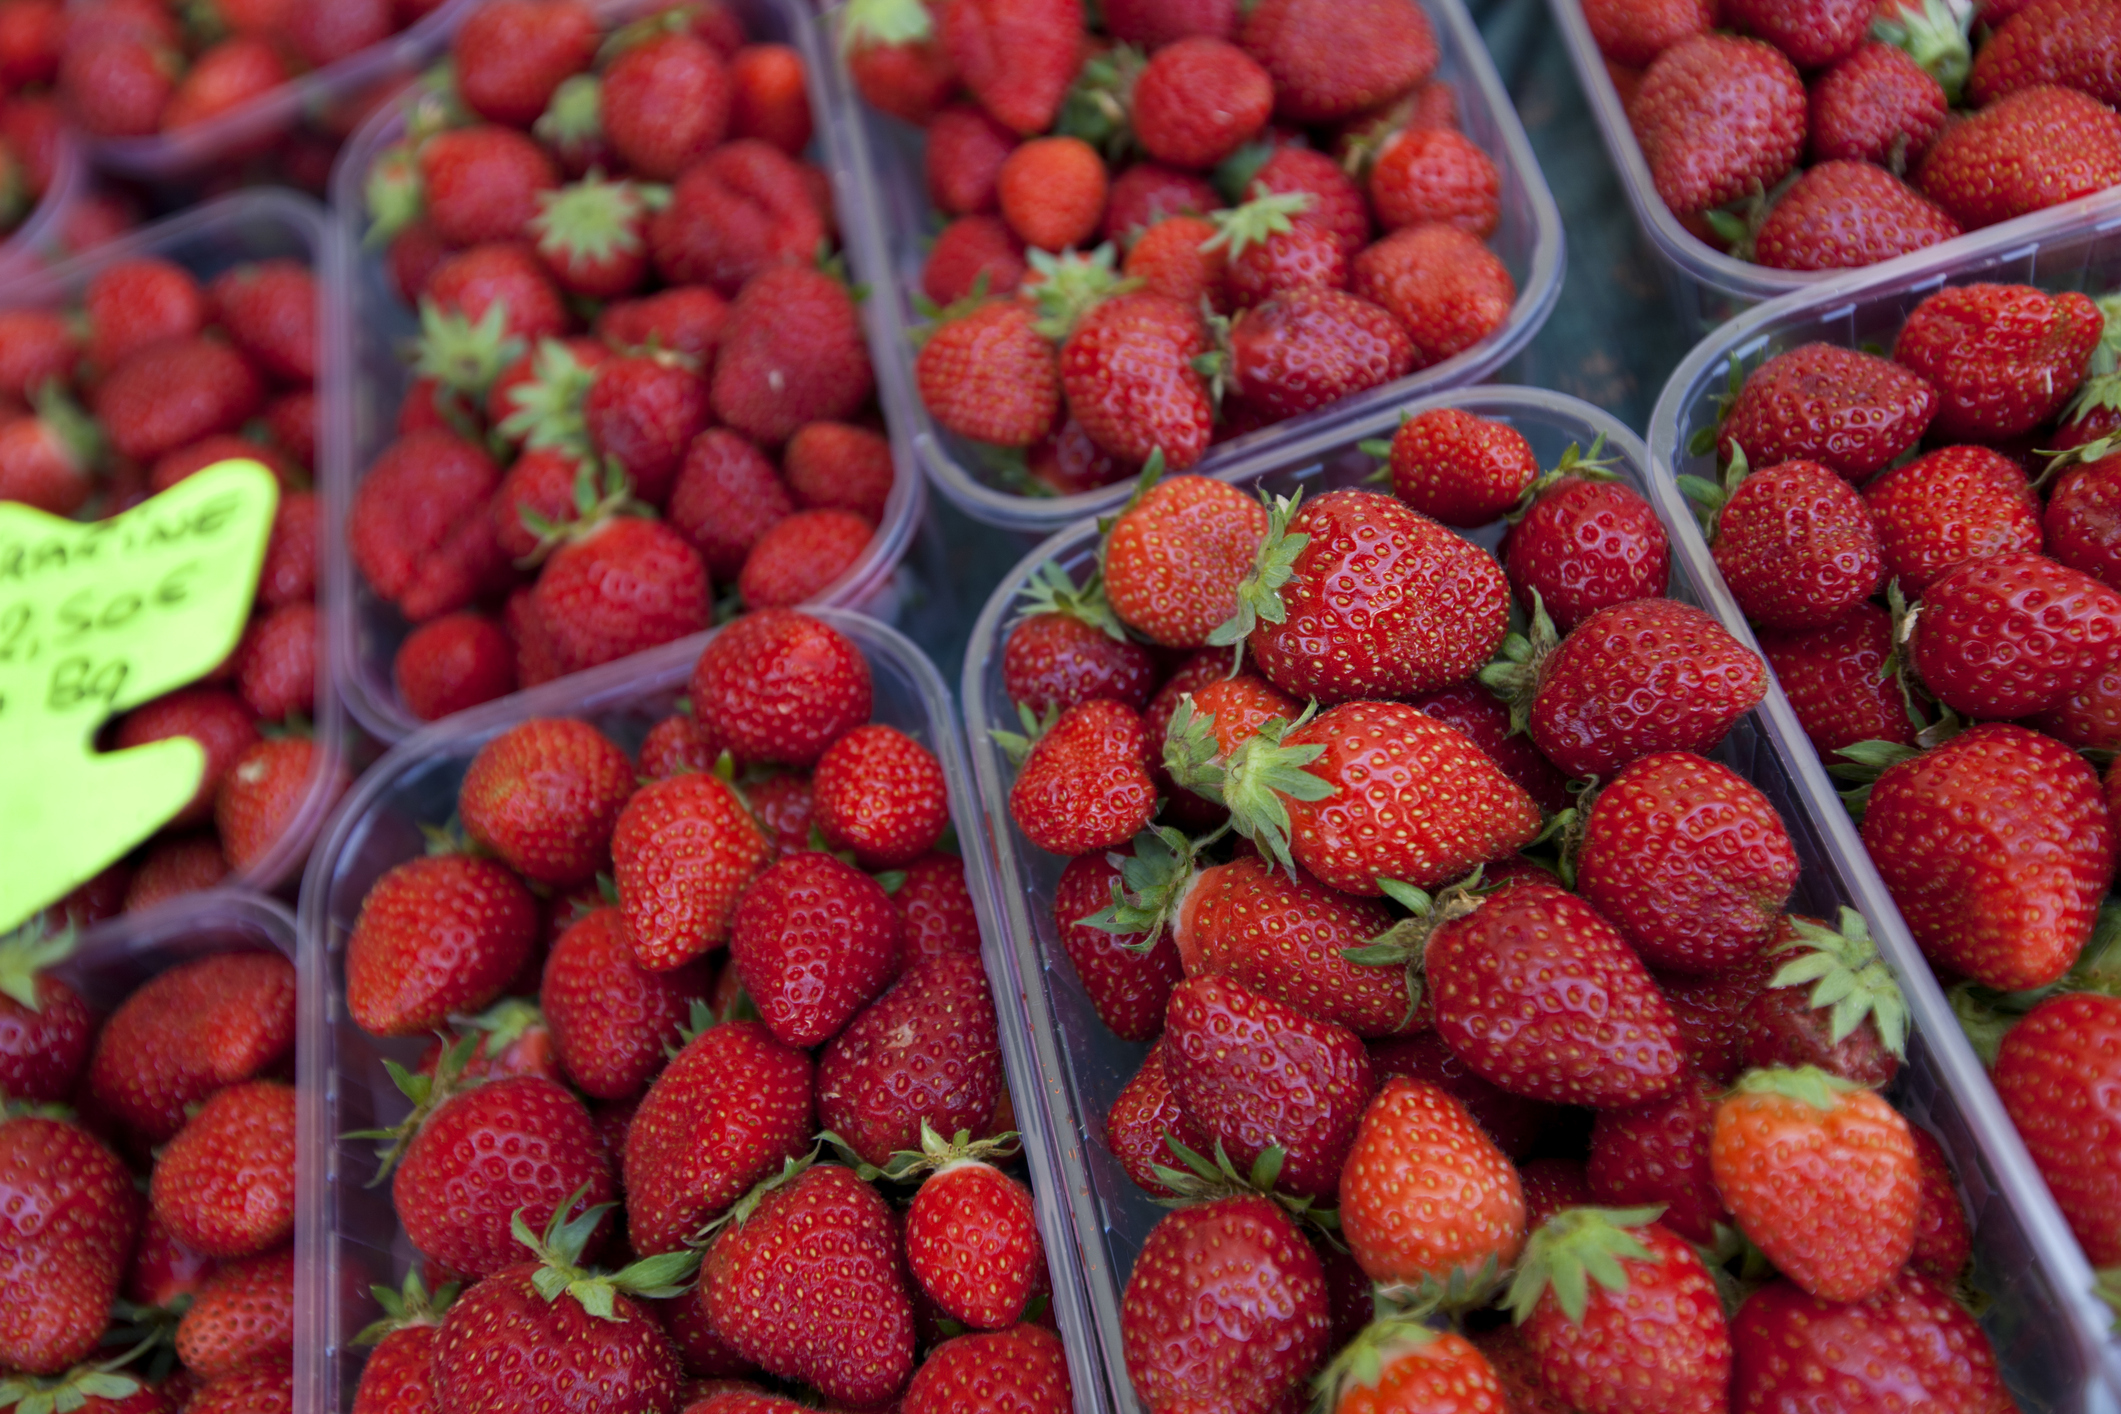 strawberries help reduce ldl cholesterol naturally